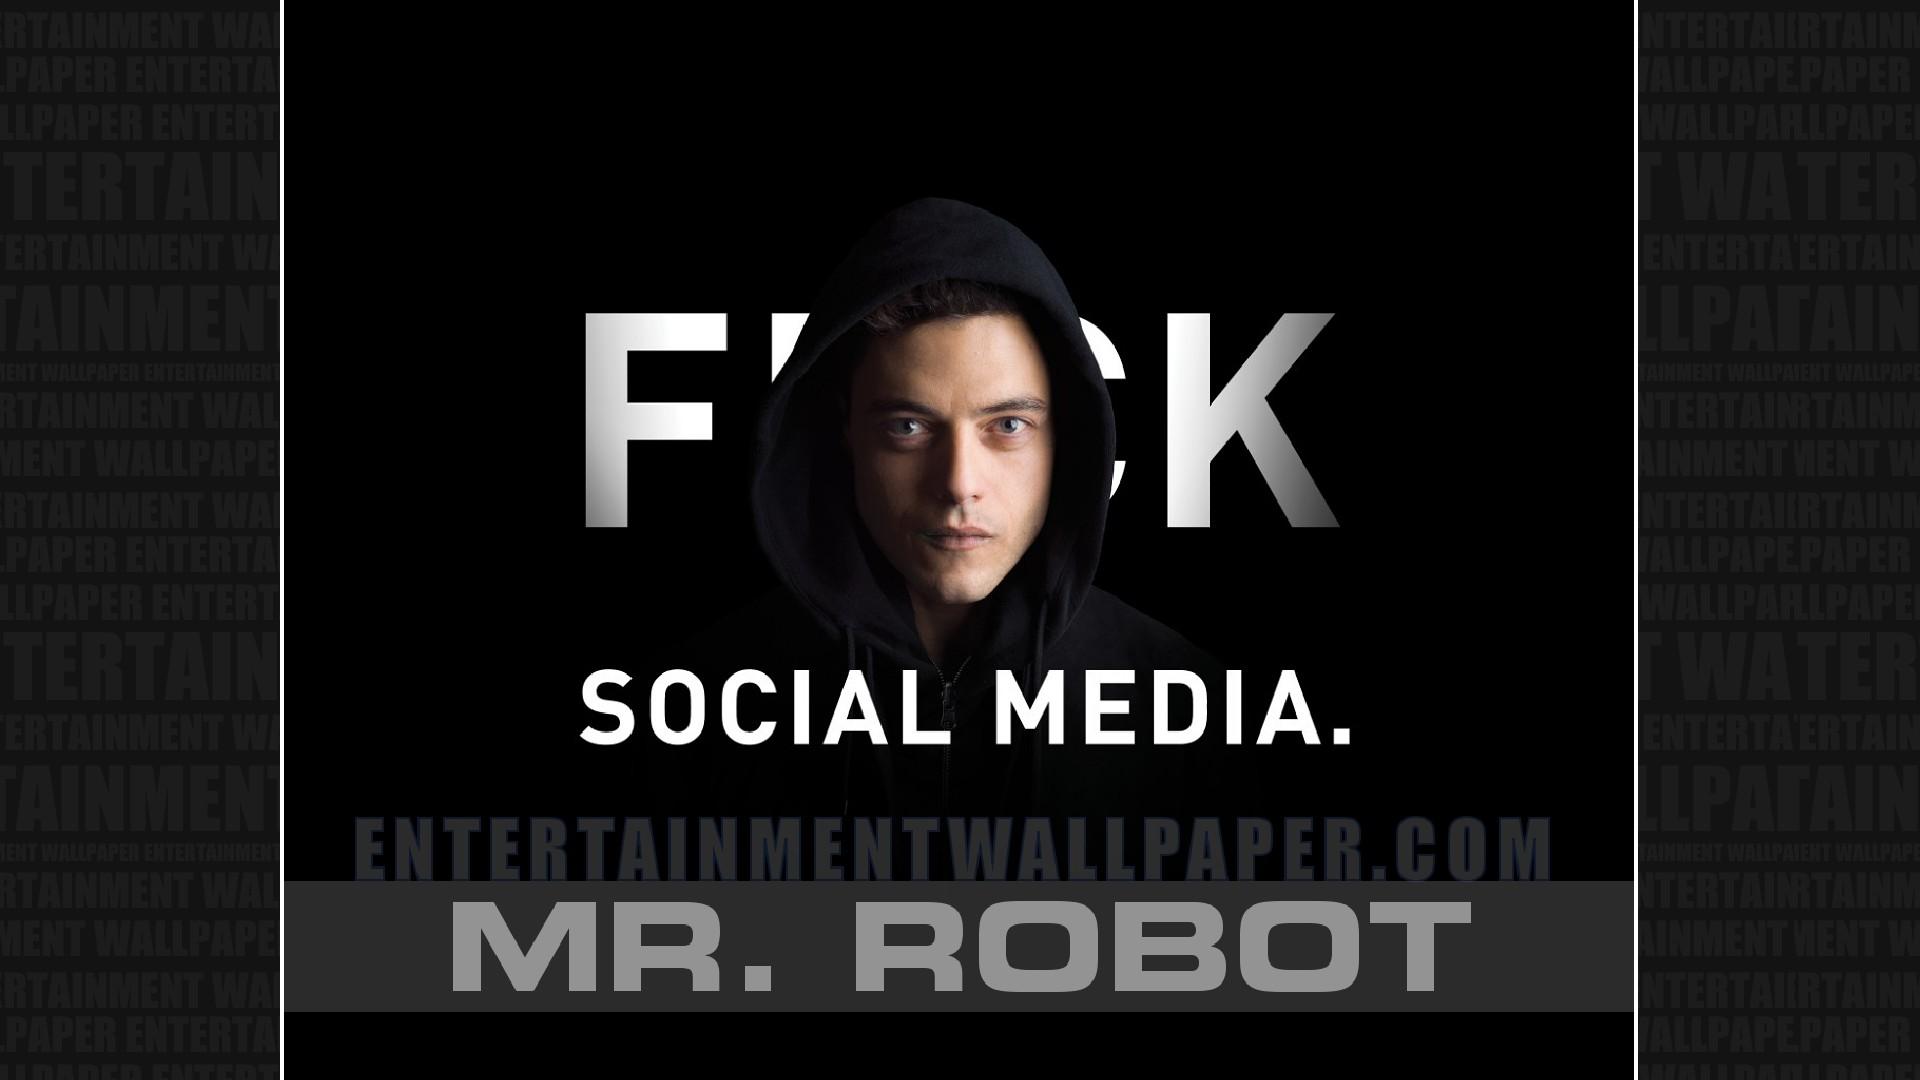 Mr. Robot fond d'écran